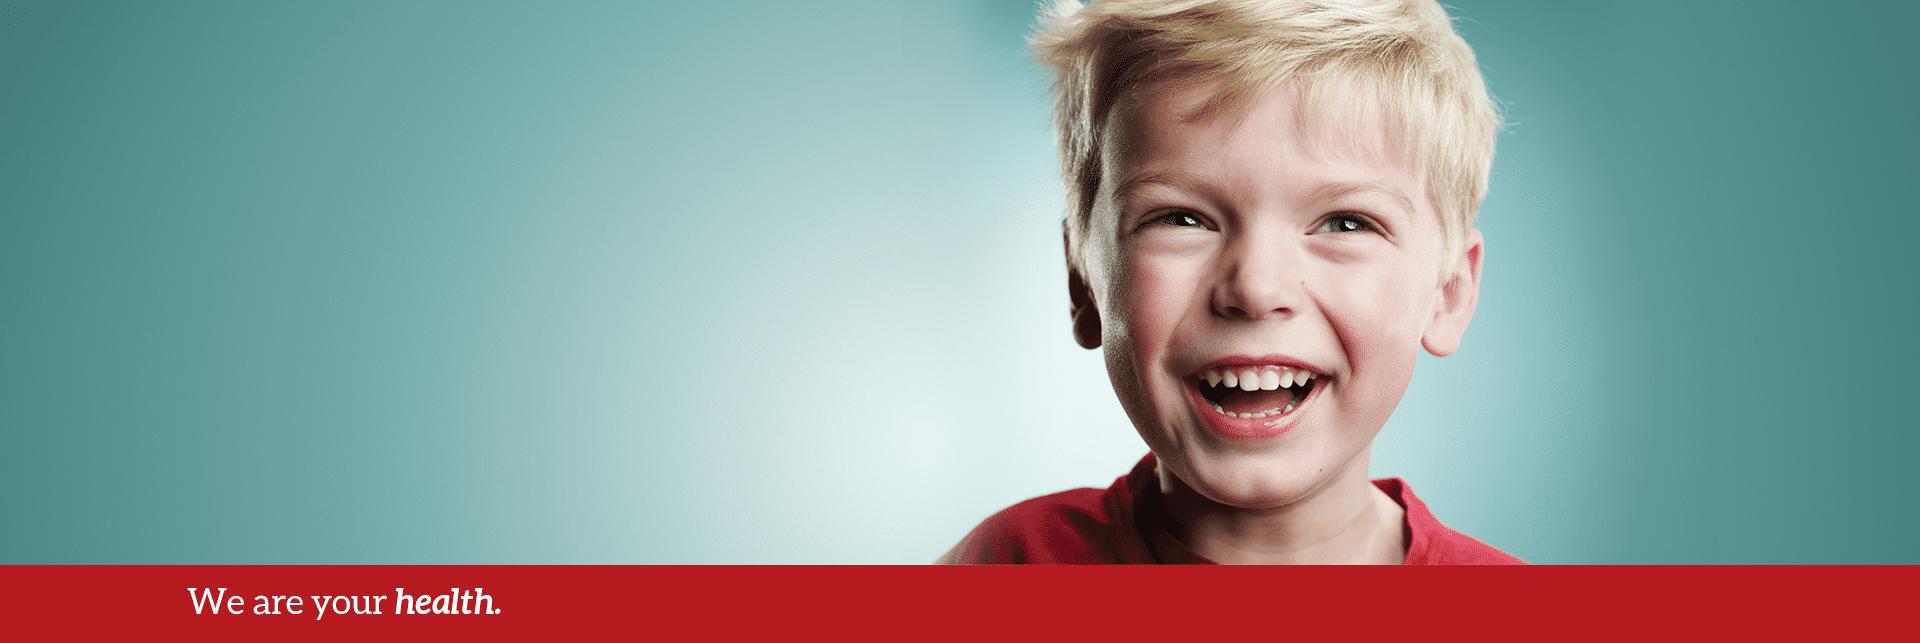 CHCCW kid smiling image